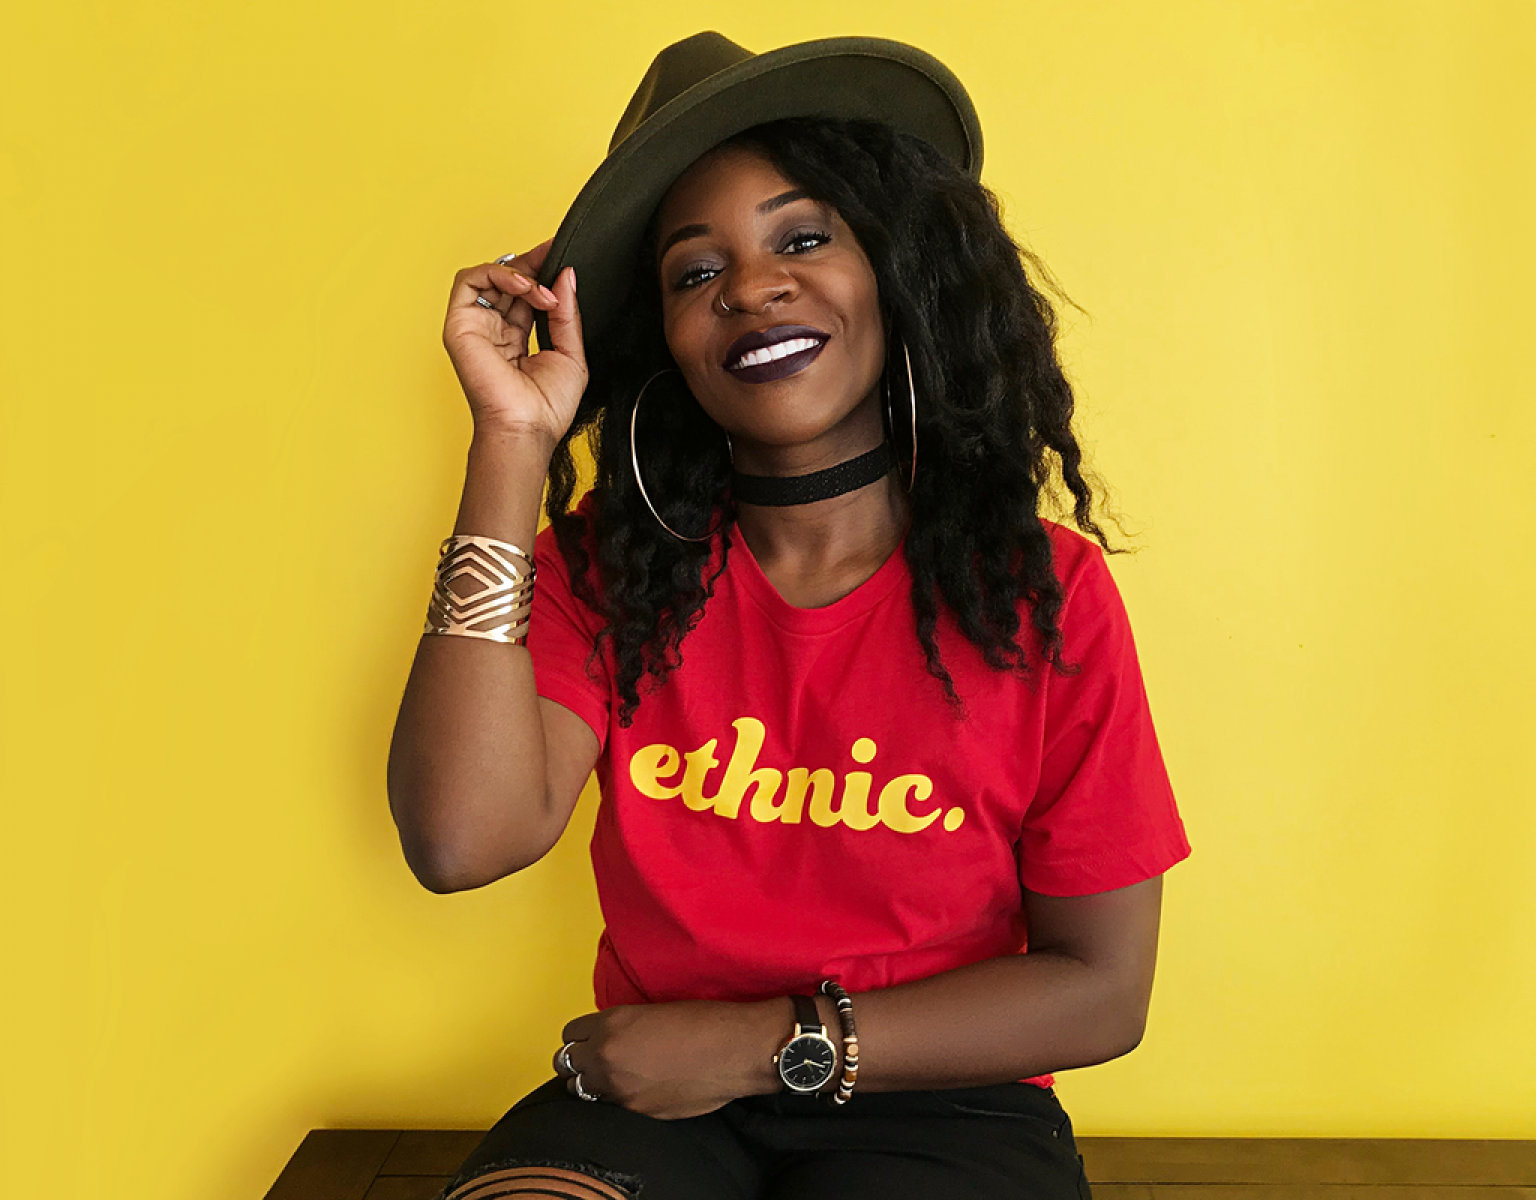 Graphic Design alumna Renee Richards, founder of Funk Era